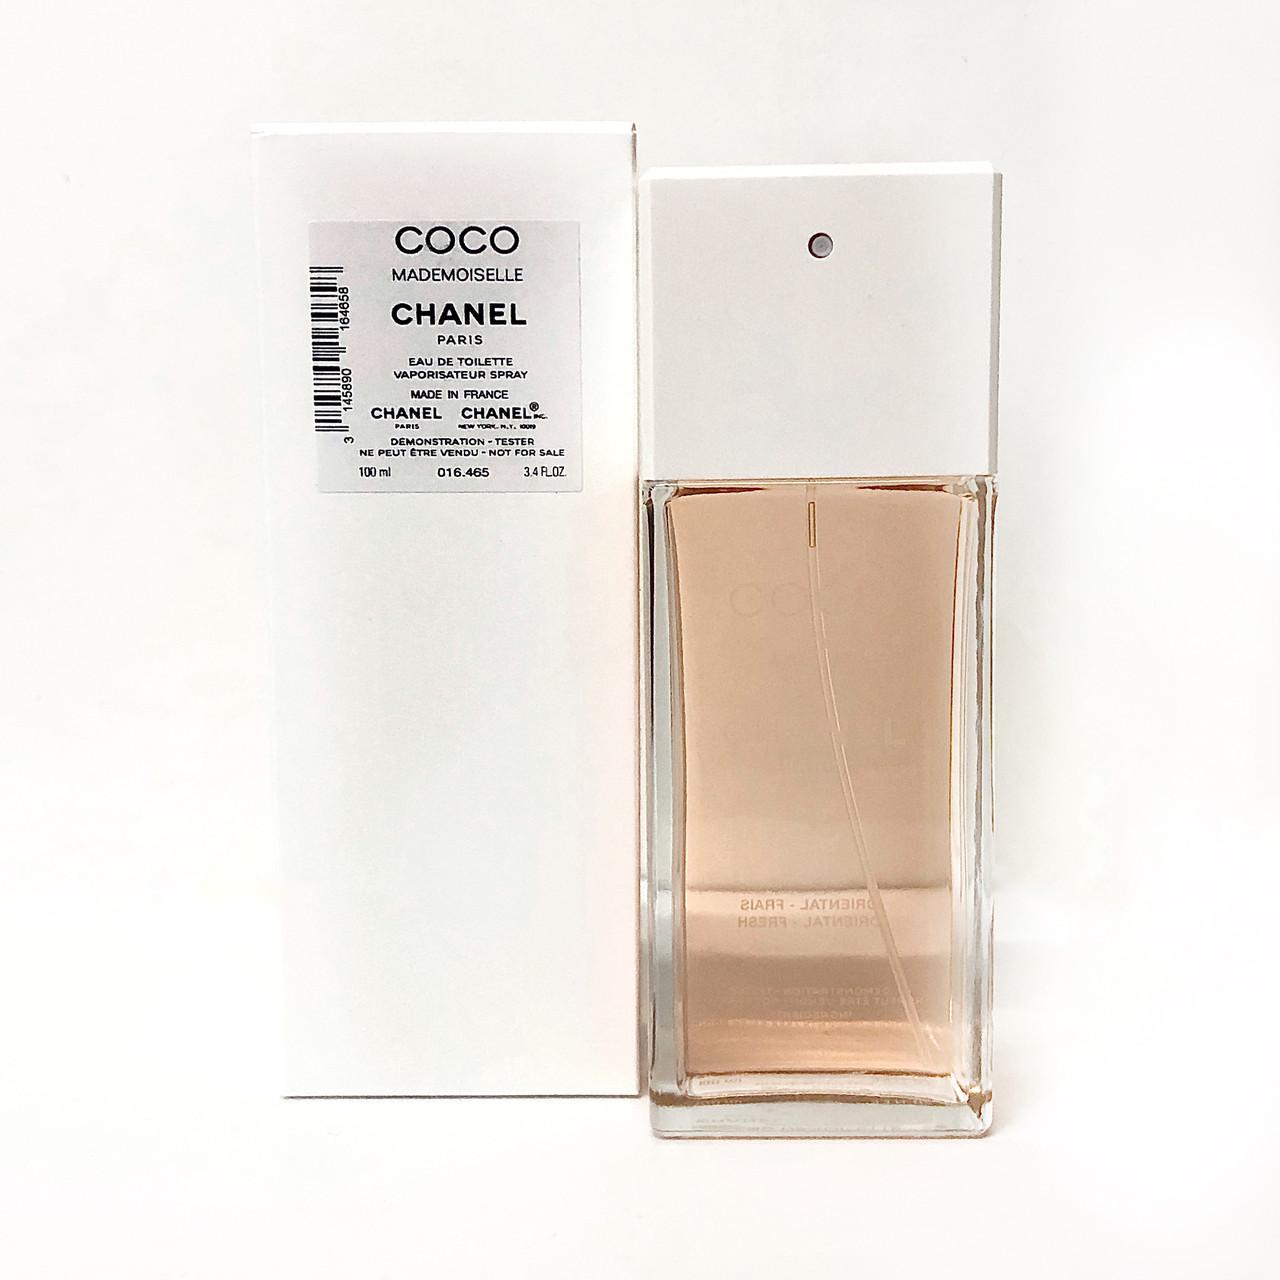 CHANEL Coco Mademoiselle 100ml (ТЕСТЕР) туалетная вода Шанель Коко Мадмуазель ОРИГИНАЛ